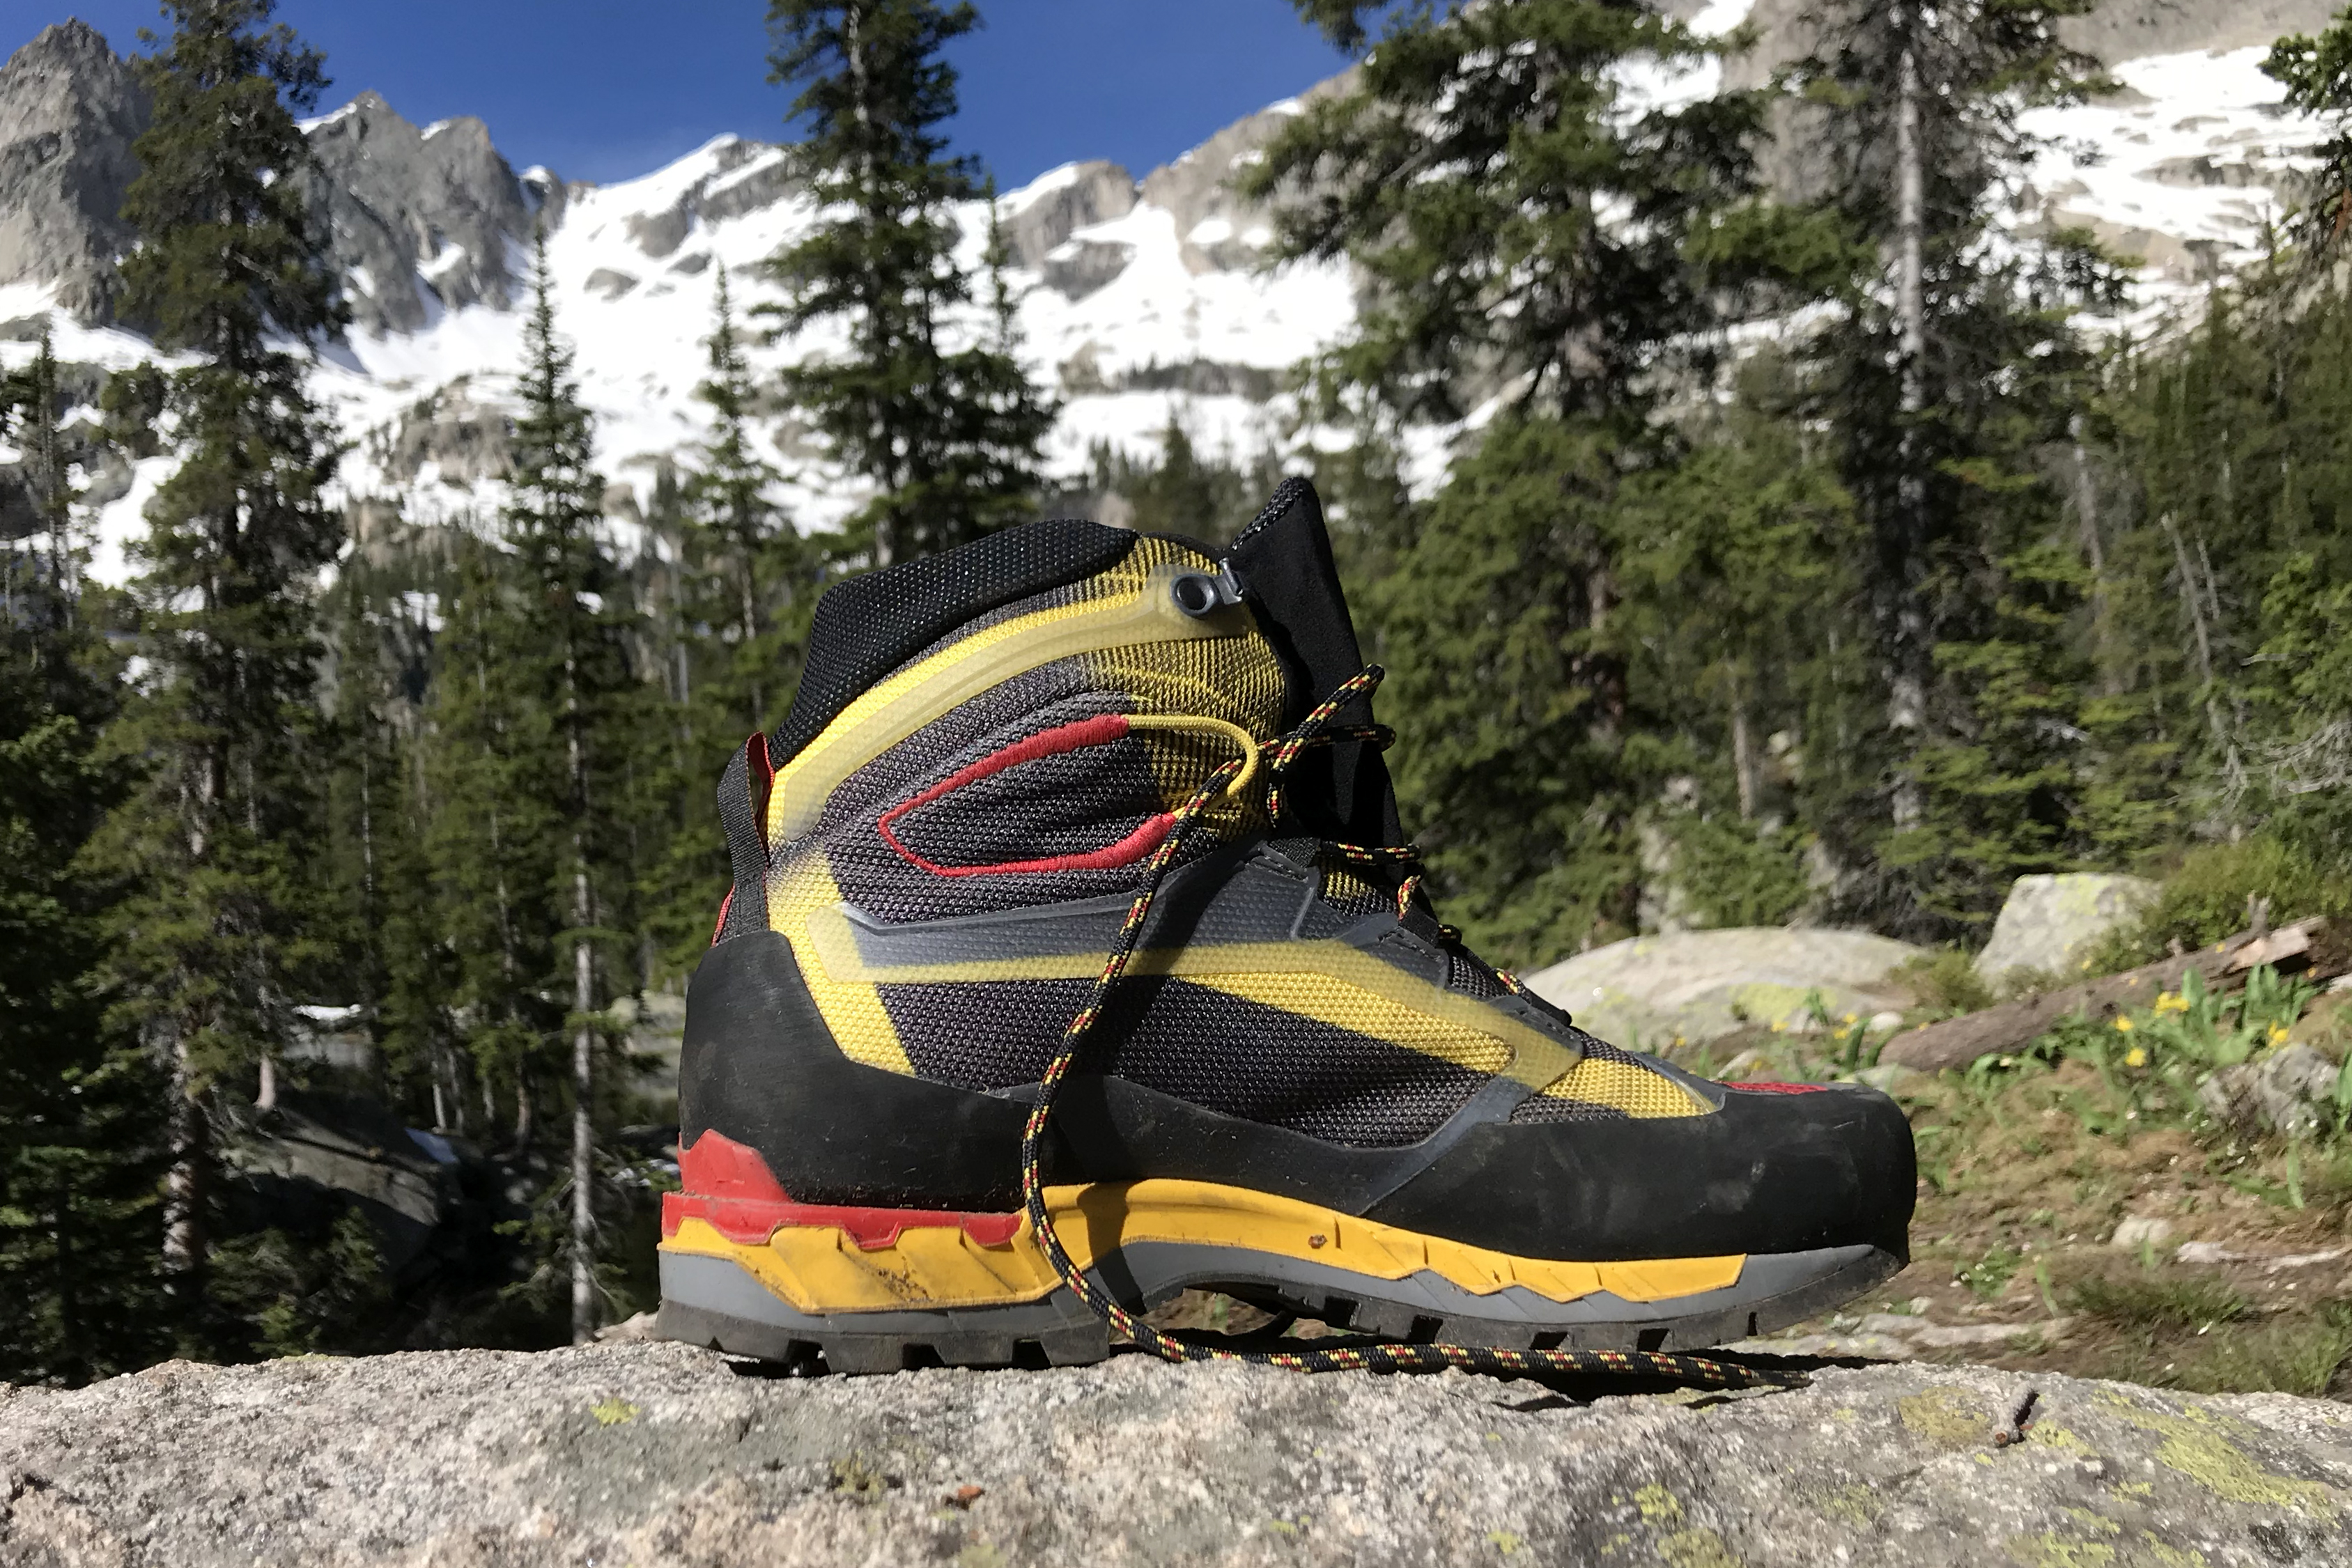 La-Sportiva-Trang-Tec-GTX-Boot-mountaineering